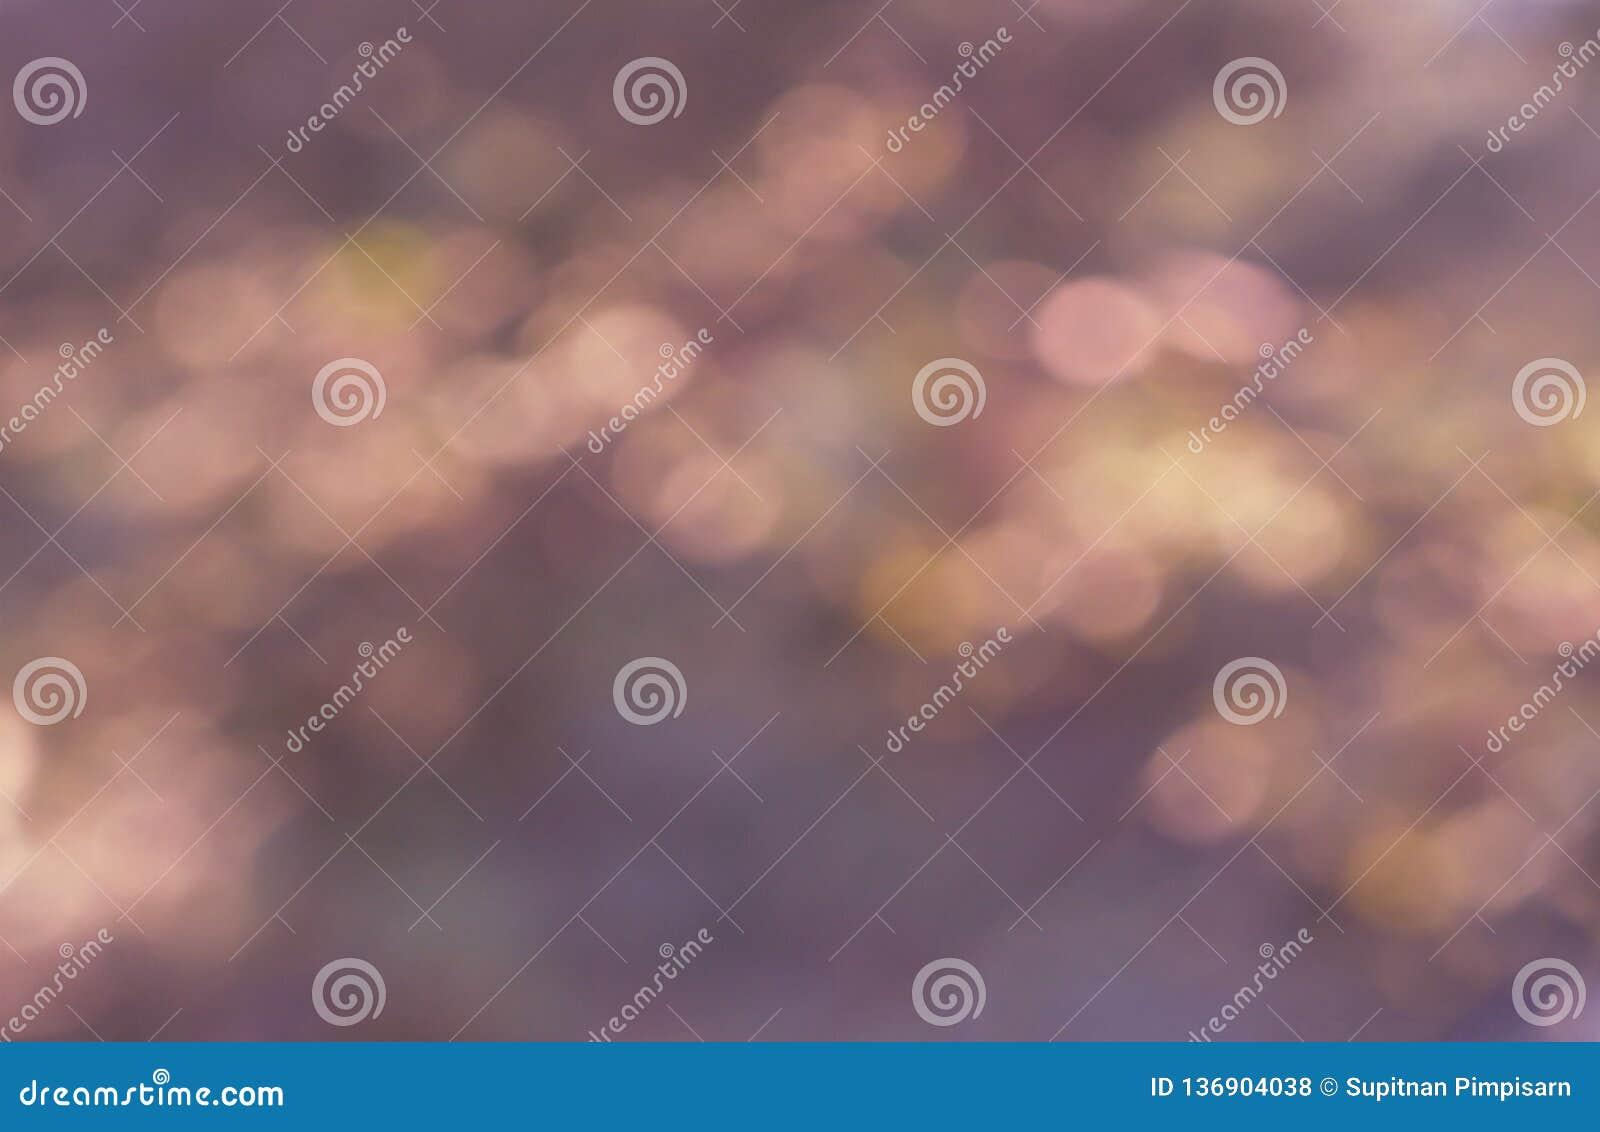 Bokeh抽象浅粉红色的背景影像纹理减速火箭在Valentine's天